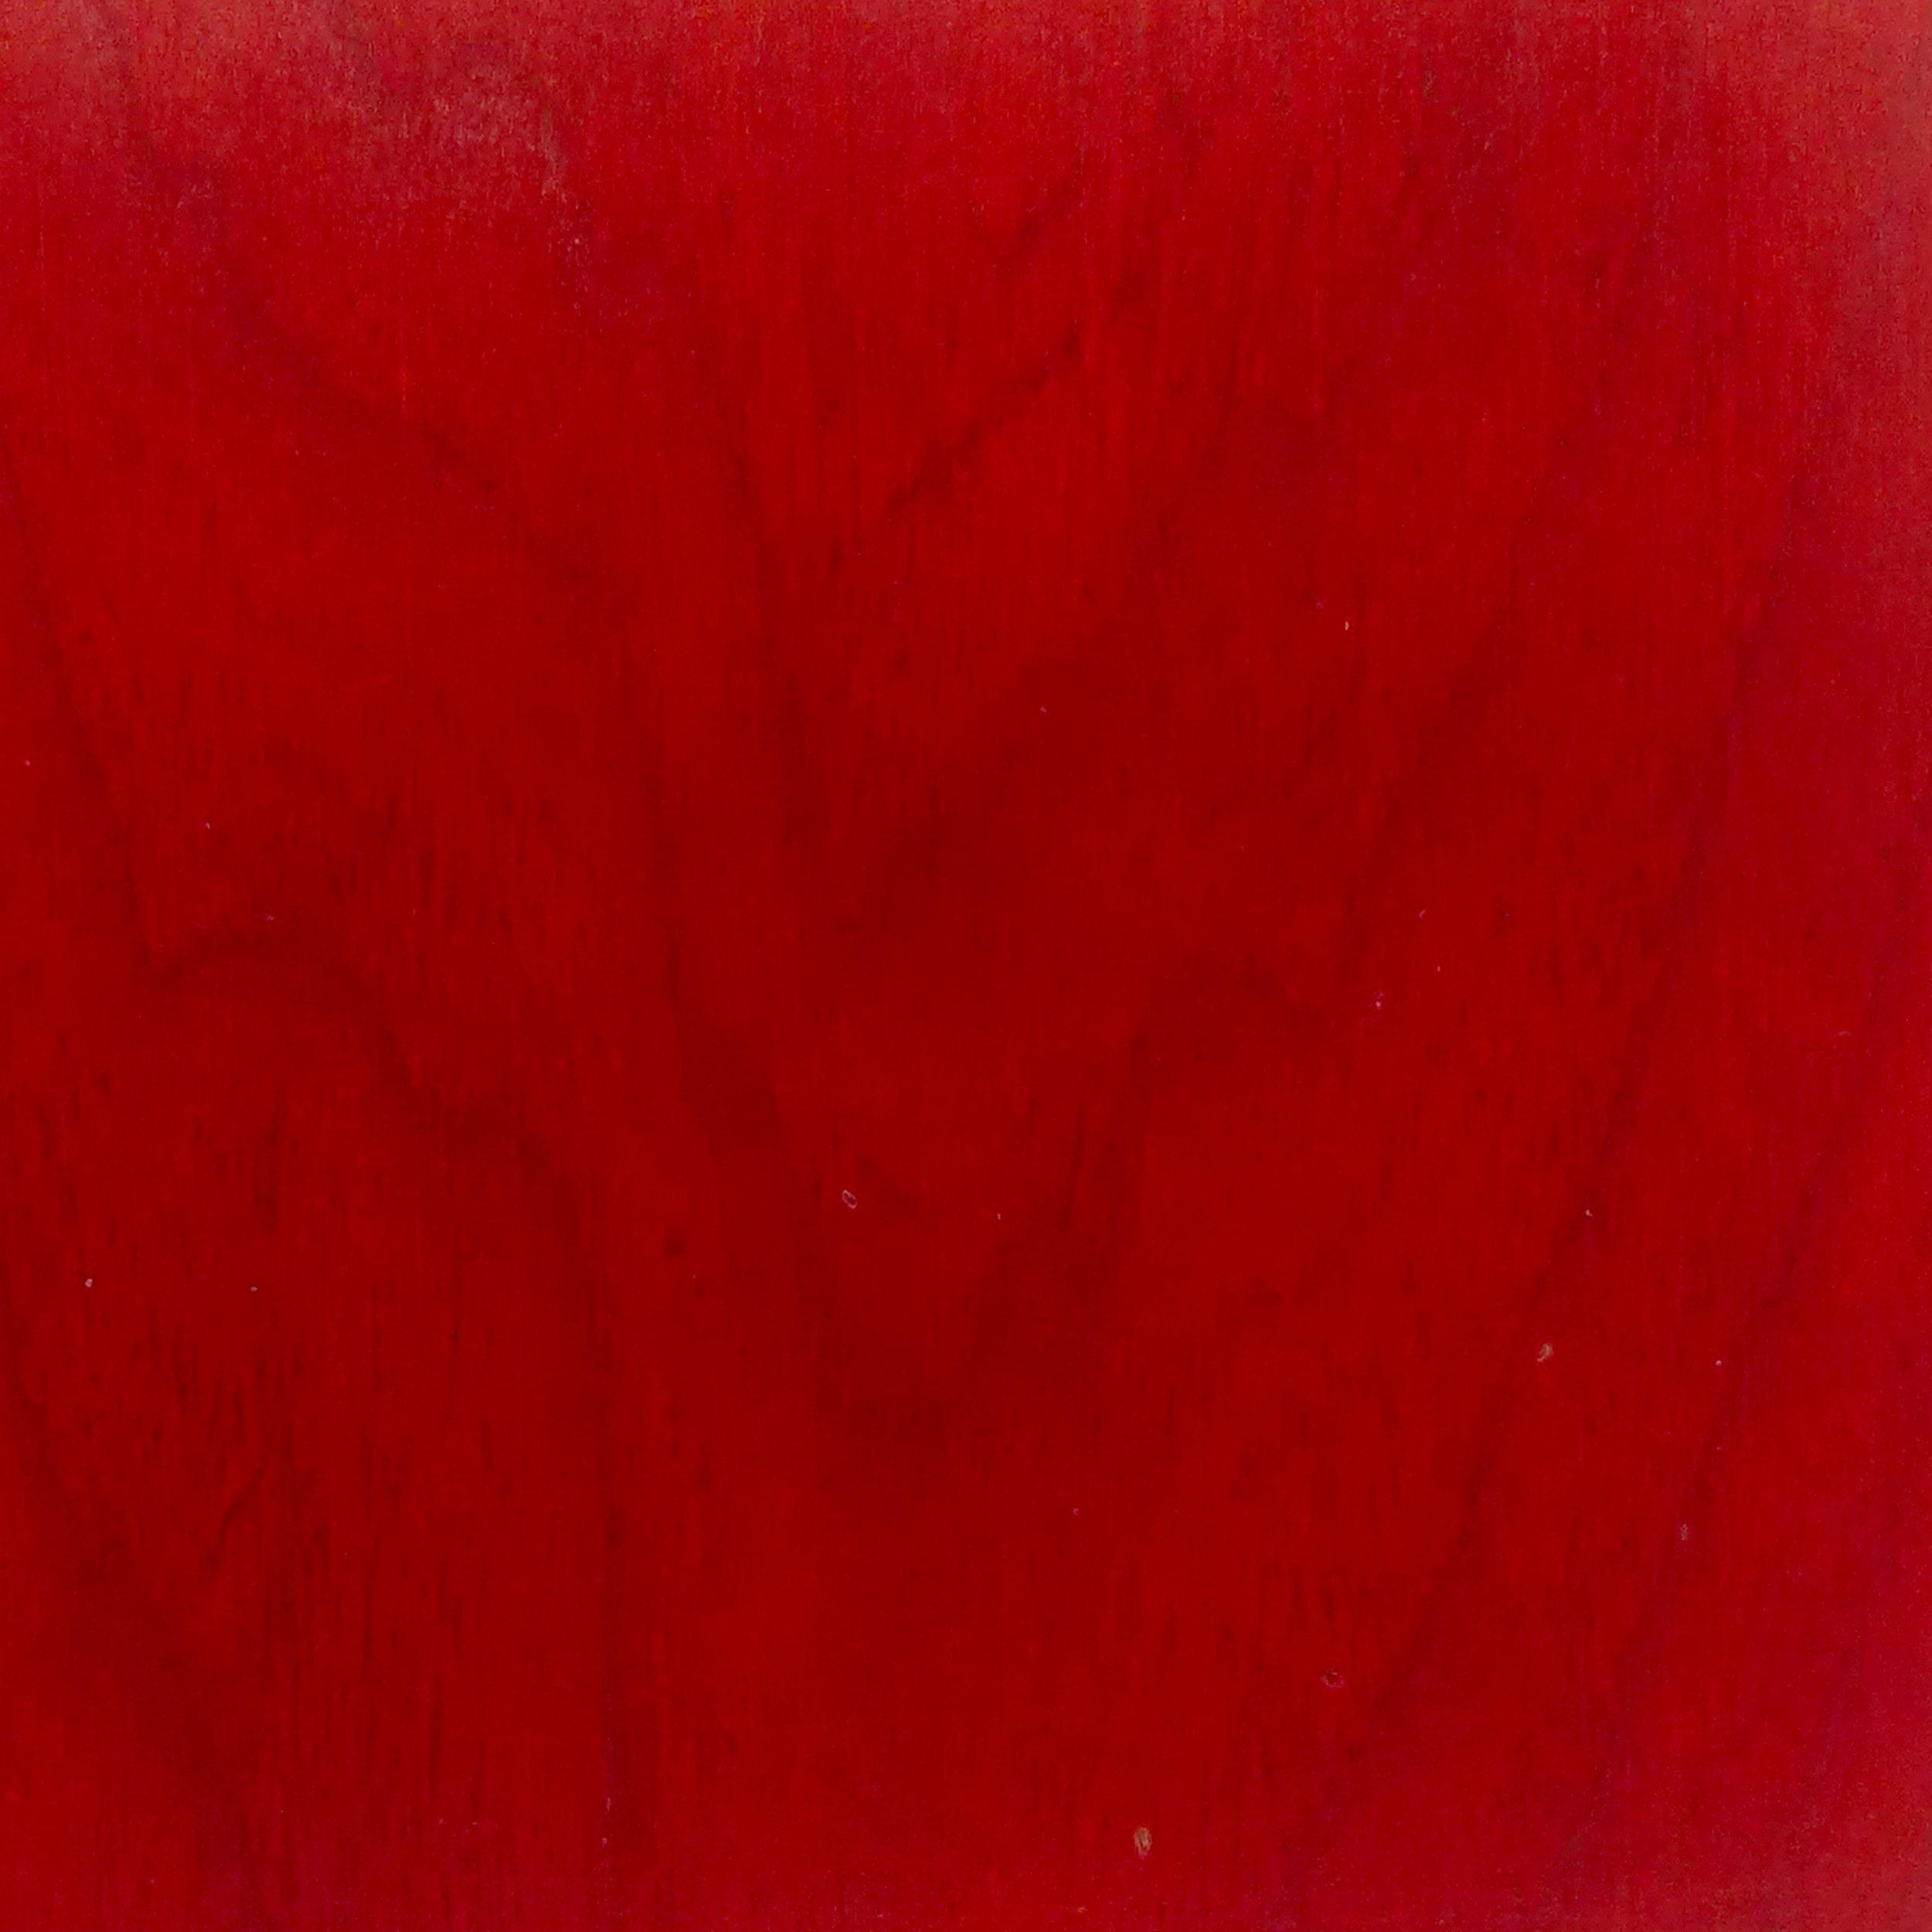 Red, Heritage Cherry